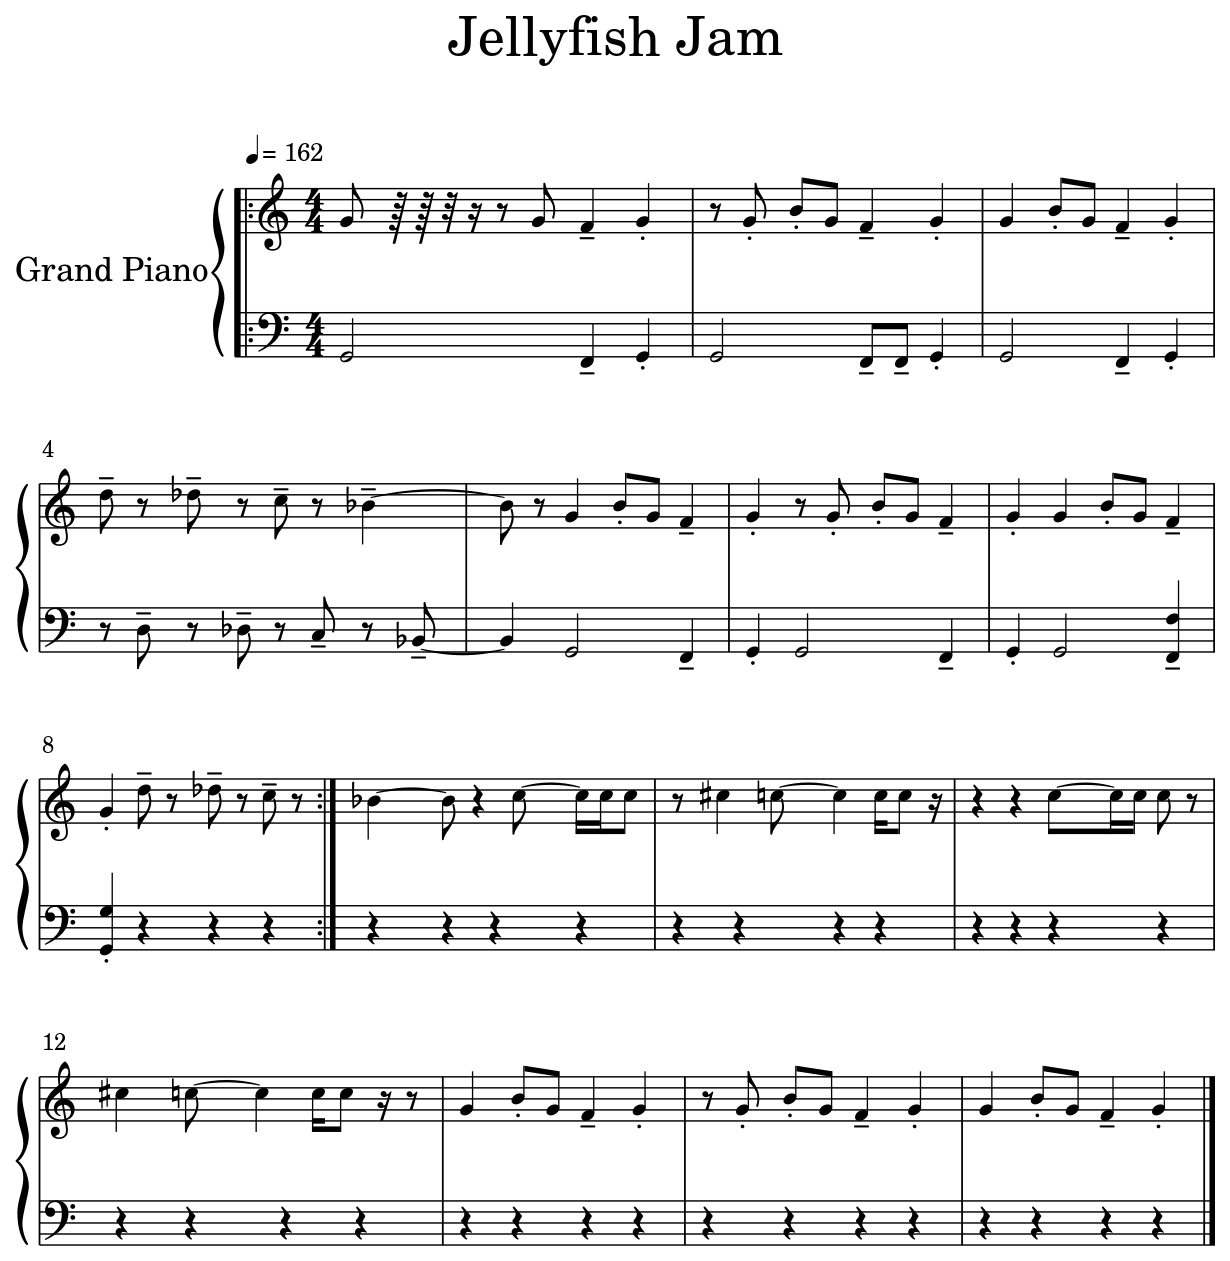 Jellyfish Jam - Flat